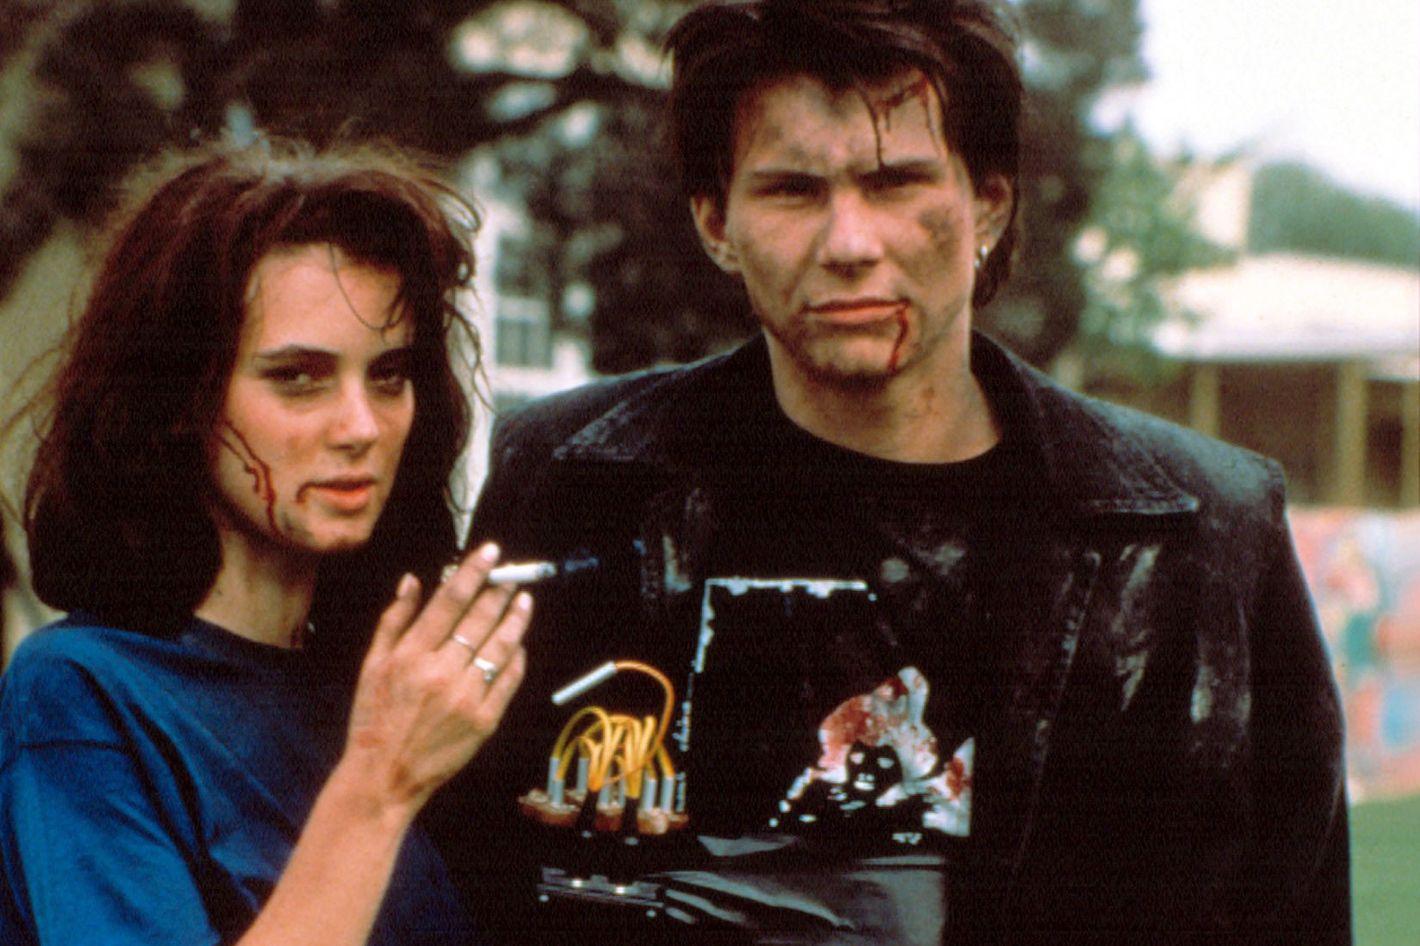 Christian Slater and Winona Ryder from the movie <i>Heathers</i>.